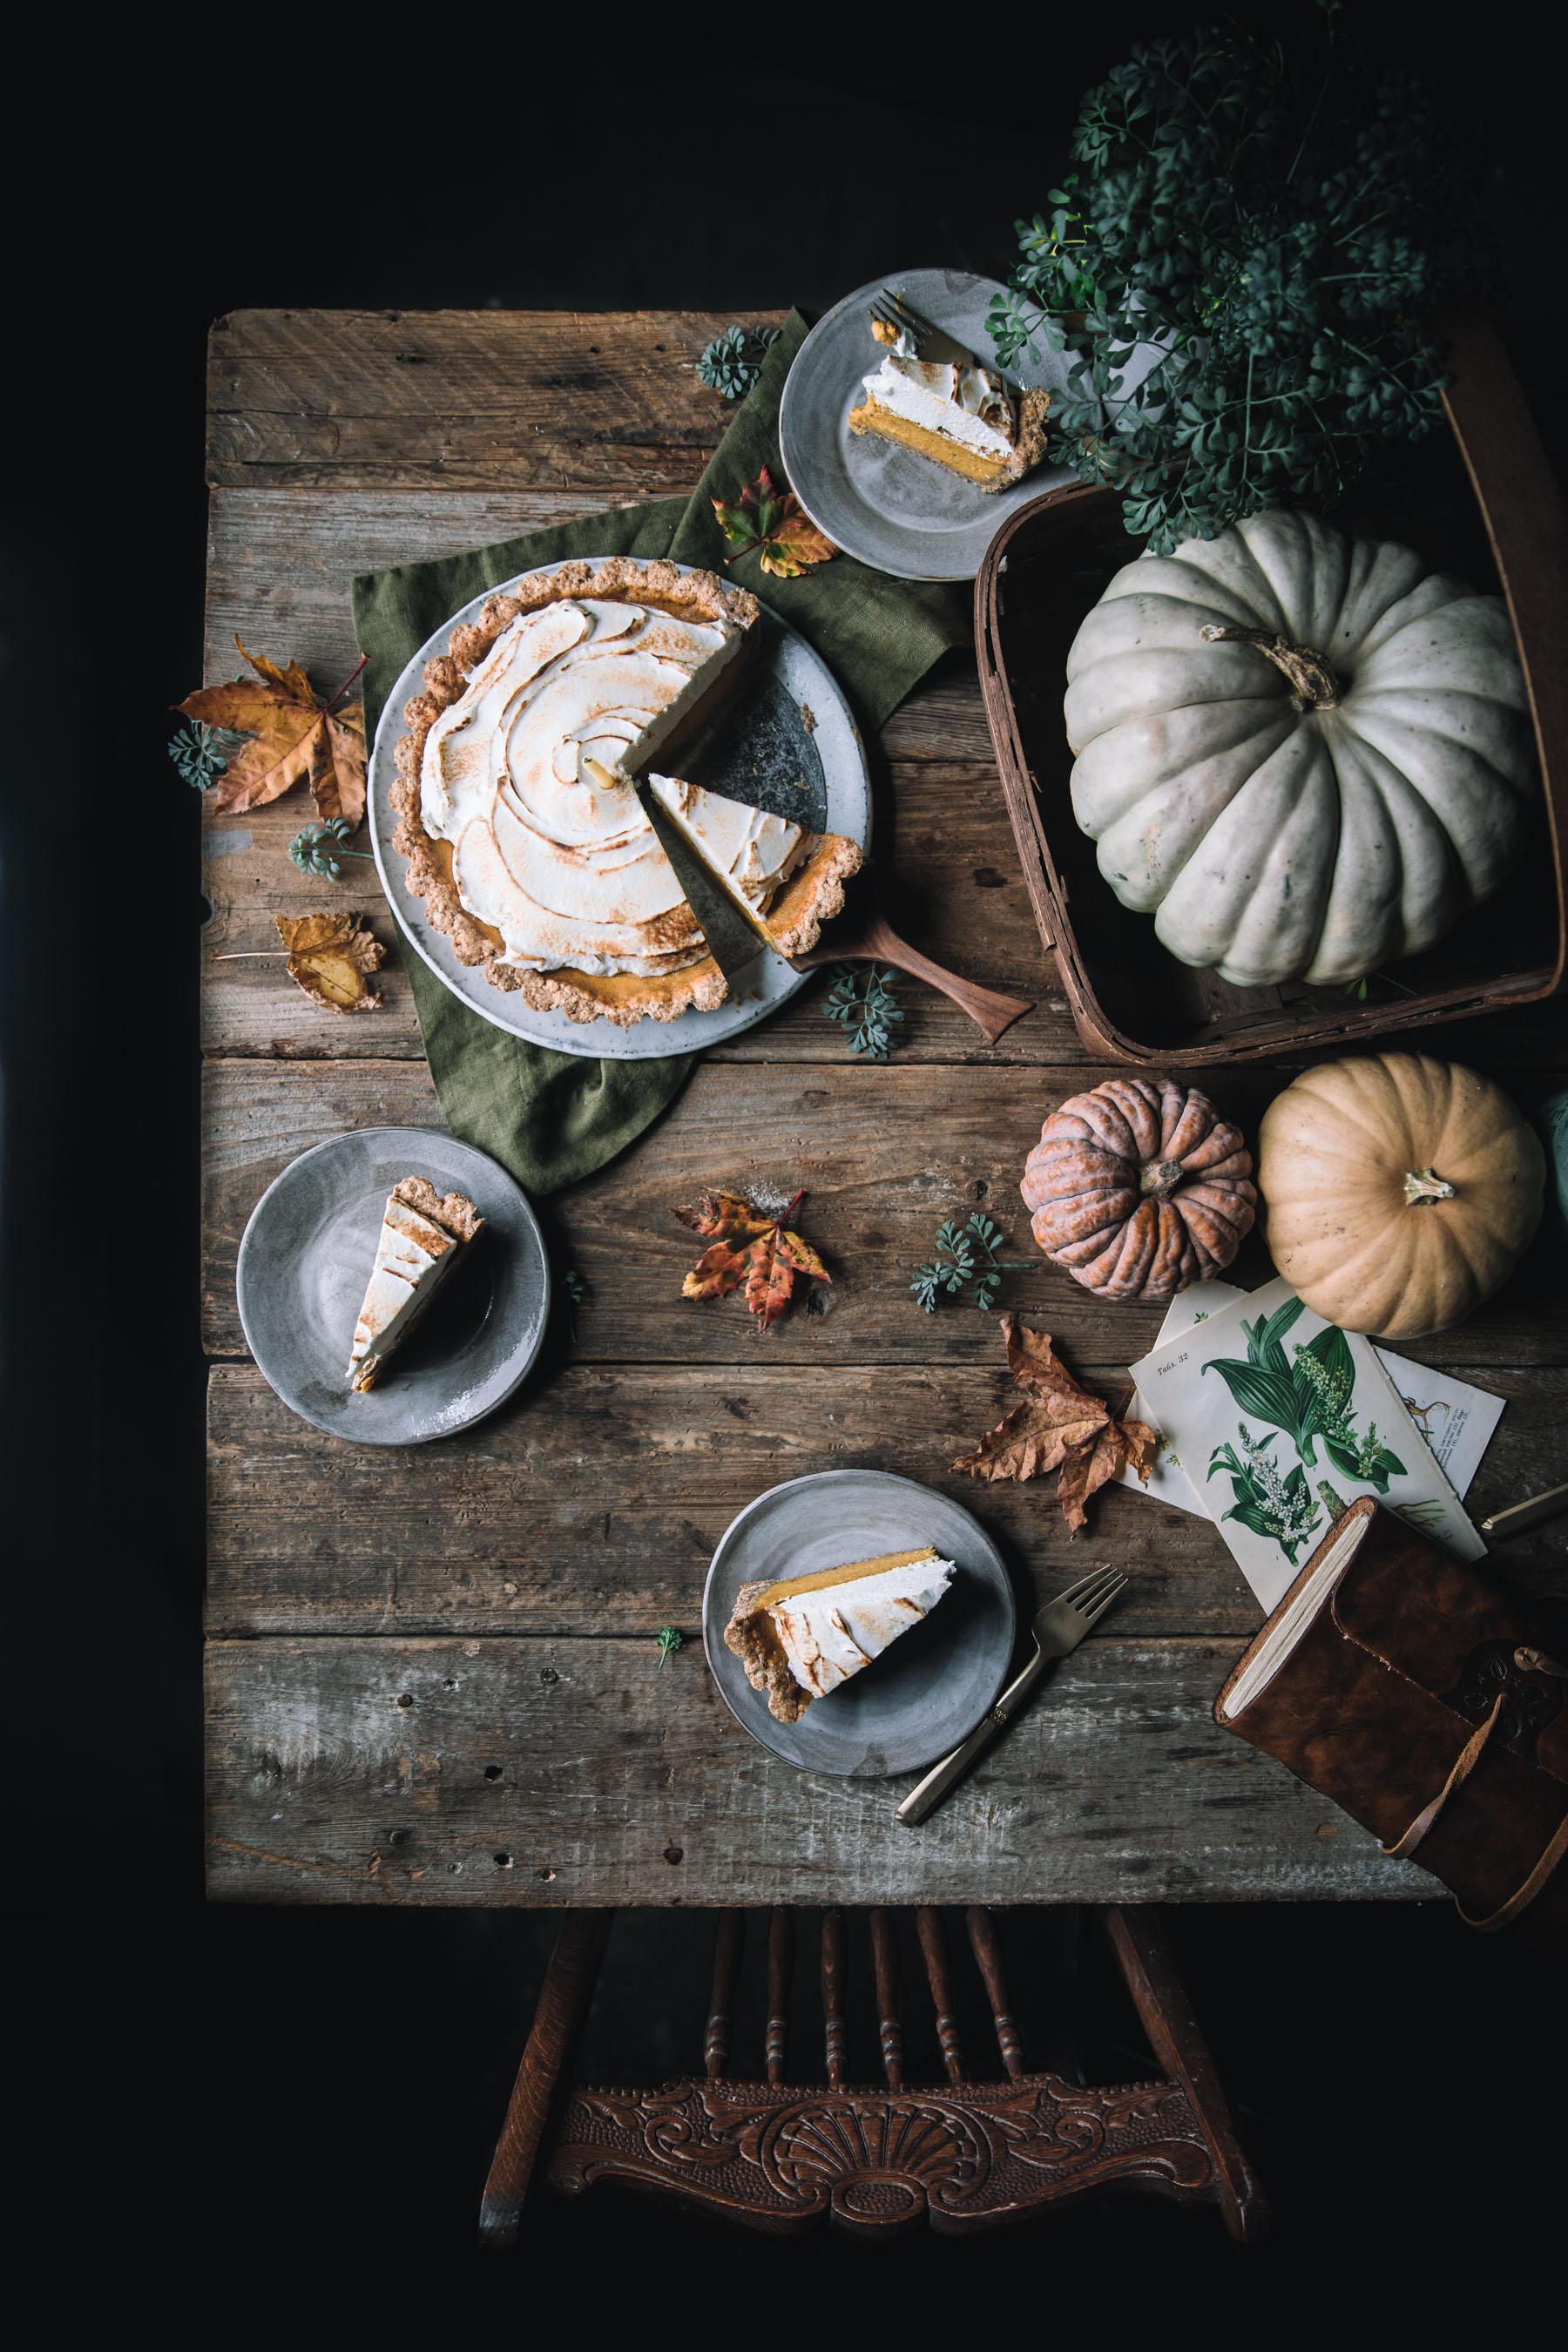 Pumpkin Meringue Pie with a Graham Cracker Crust